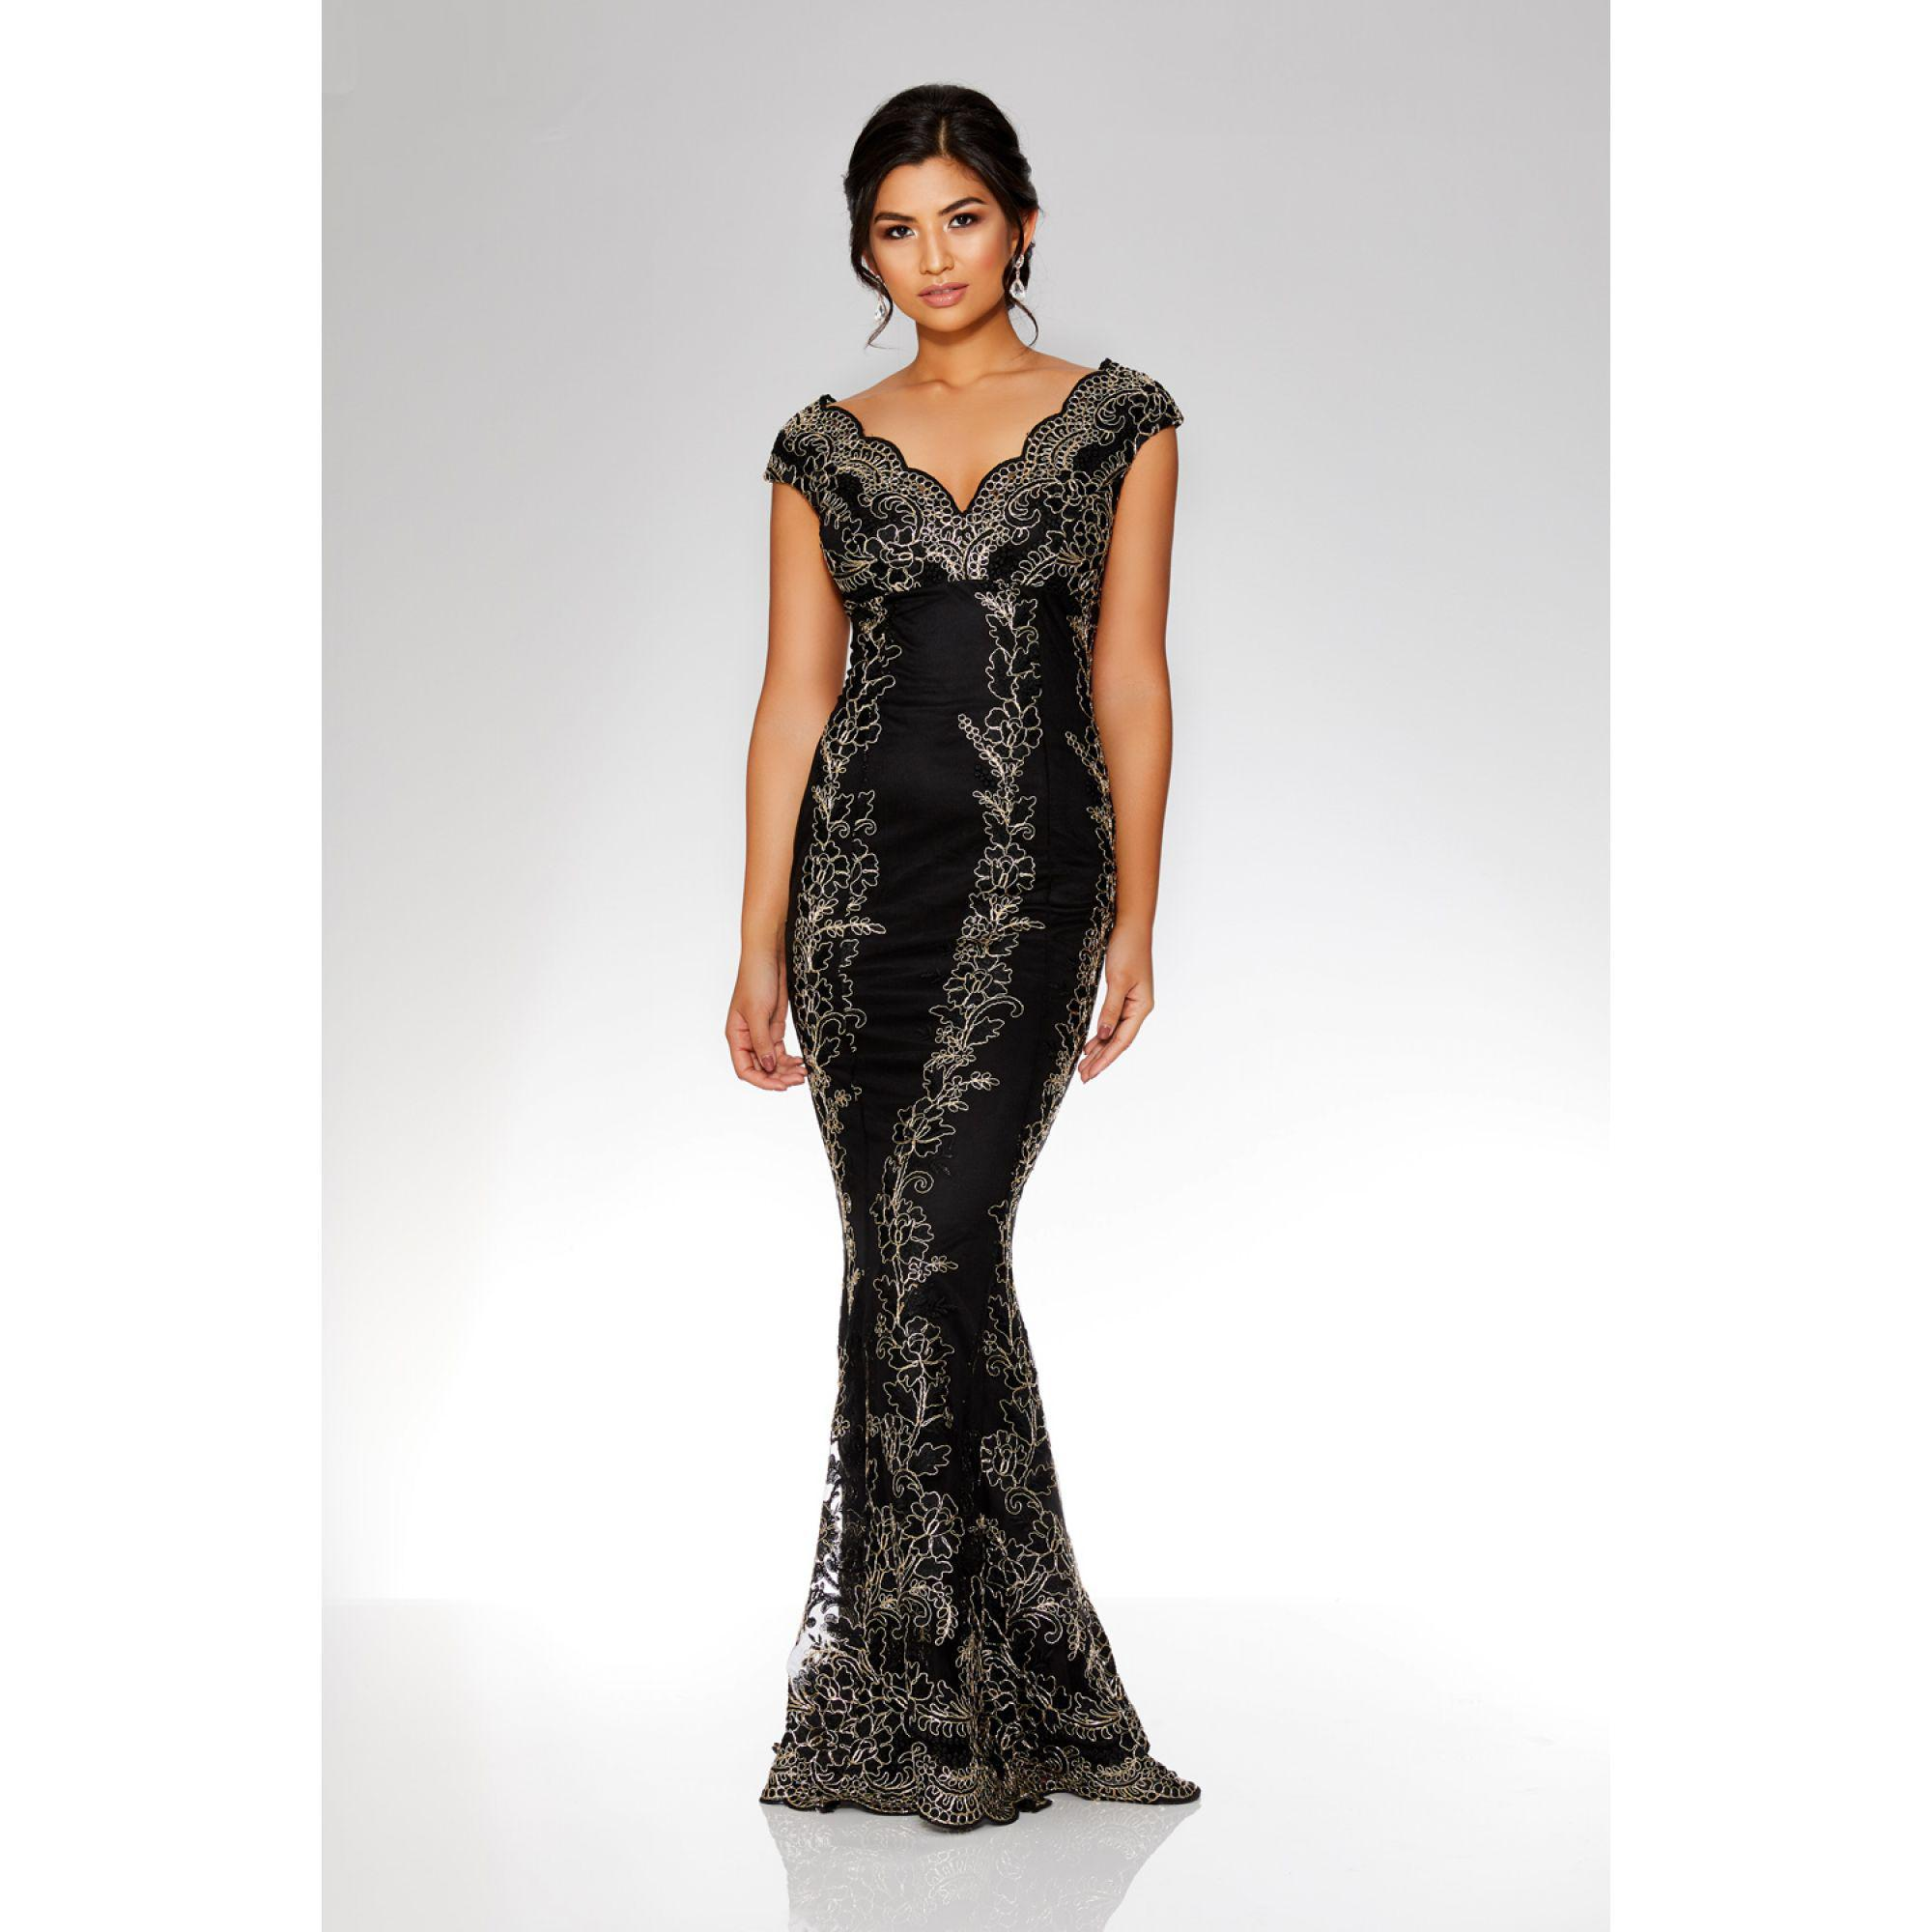 0da875d0ed2 Quiz Black And Gold Sequin Maxi Dress - Gomes Weine AG